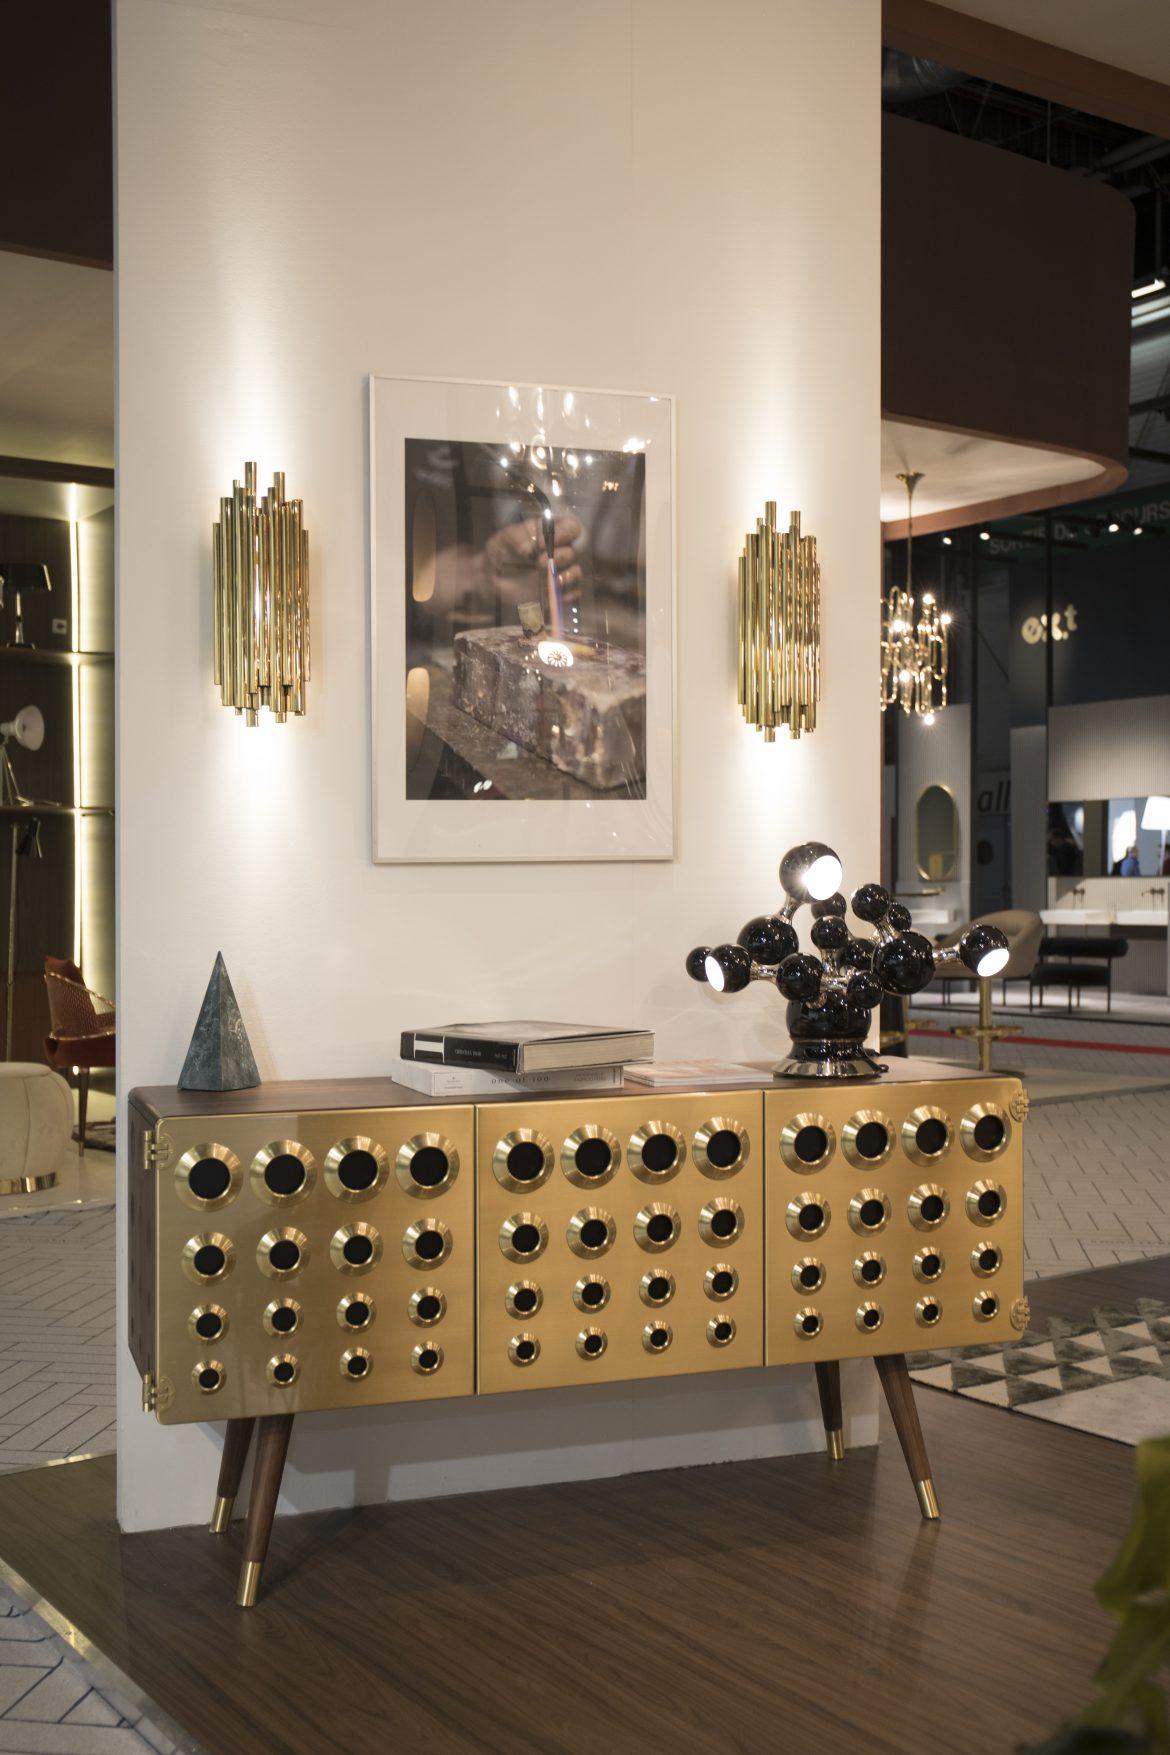 Mid-Century Furniture At Maison Et Objet 2019 mid-century furniture Mid-Century Furniture At Maison Et Objet 2019 Mid Century Furniture At Maison Et Objet 2019 1